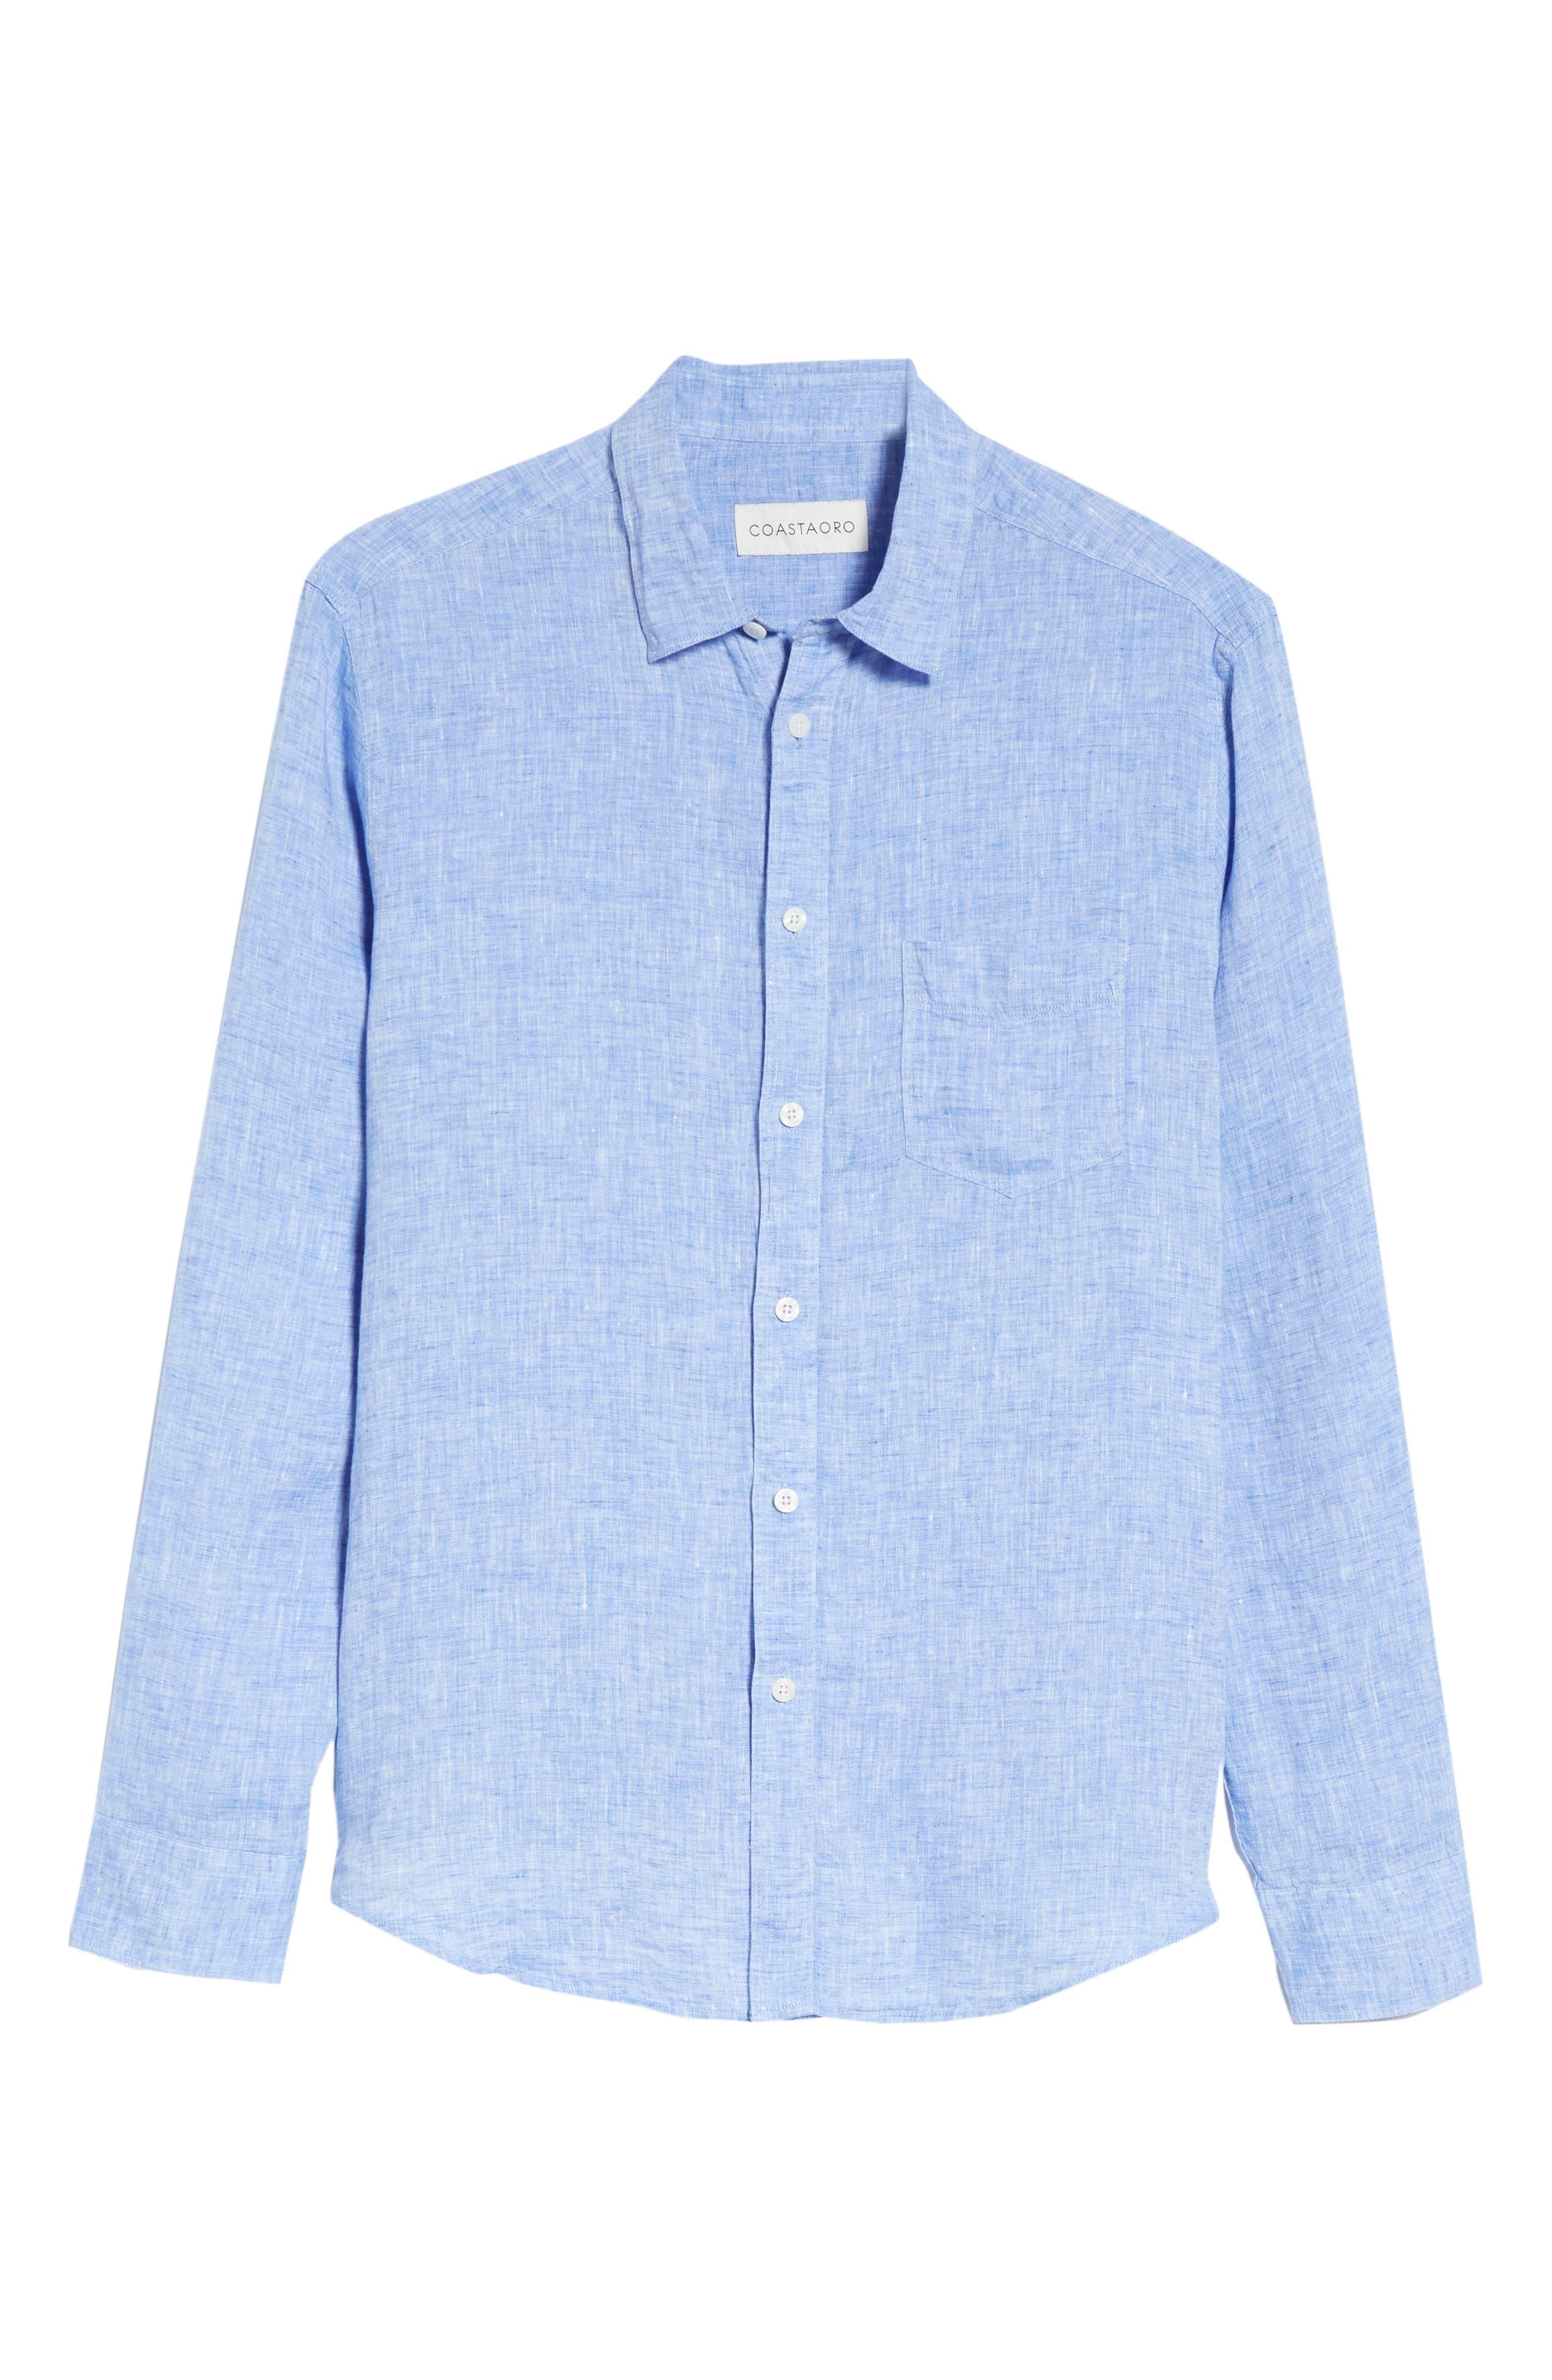 Regular Fit Solid Linen Sport Shirt,                             Alternate thumbnail 12, color,